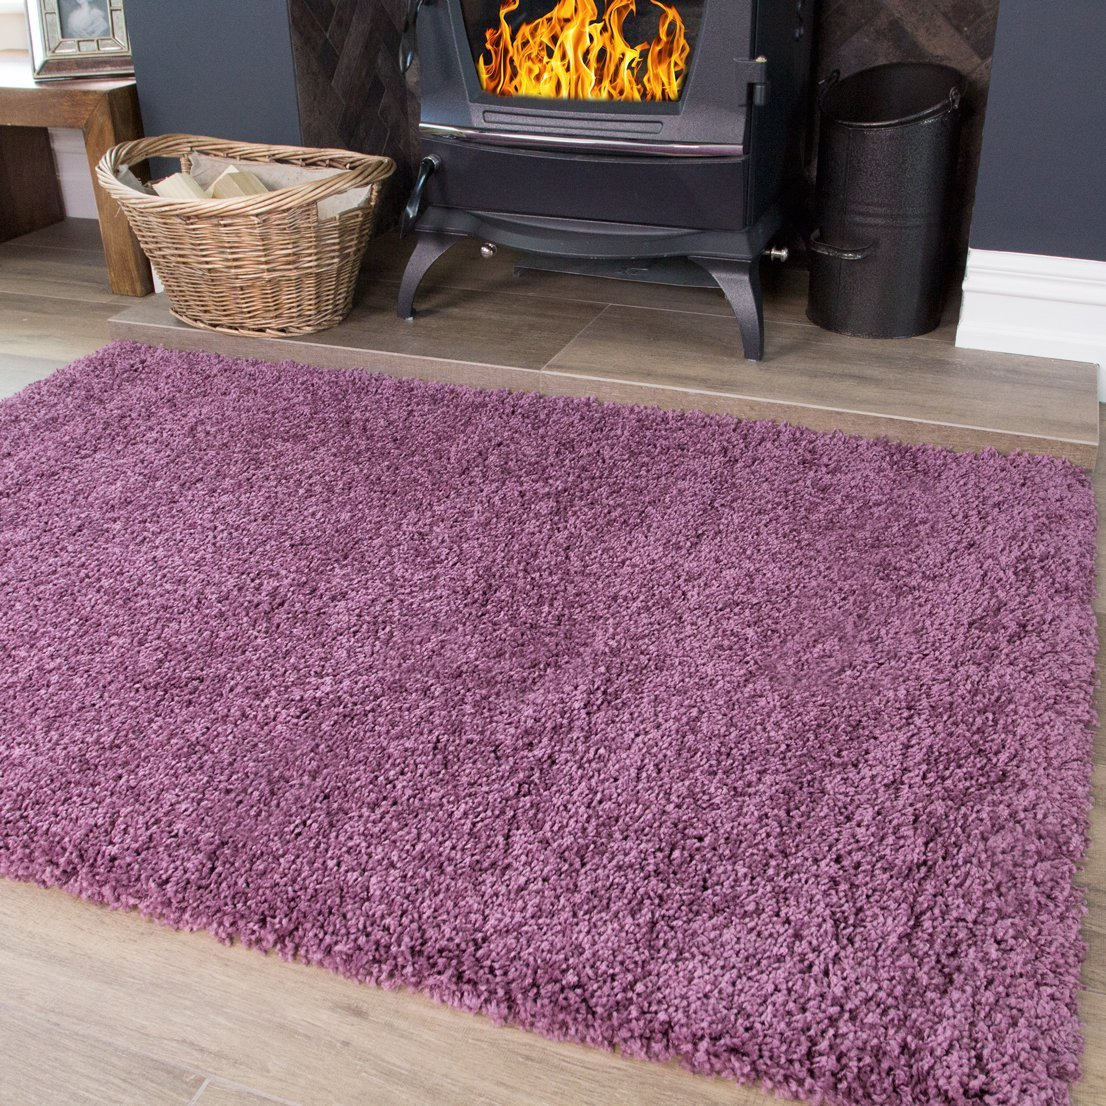 soft touch purple mauve shaggy rugs non shedding living